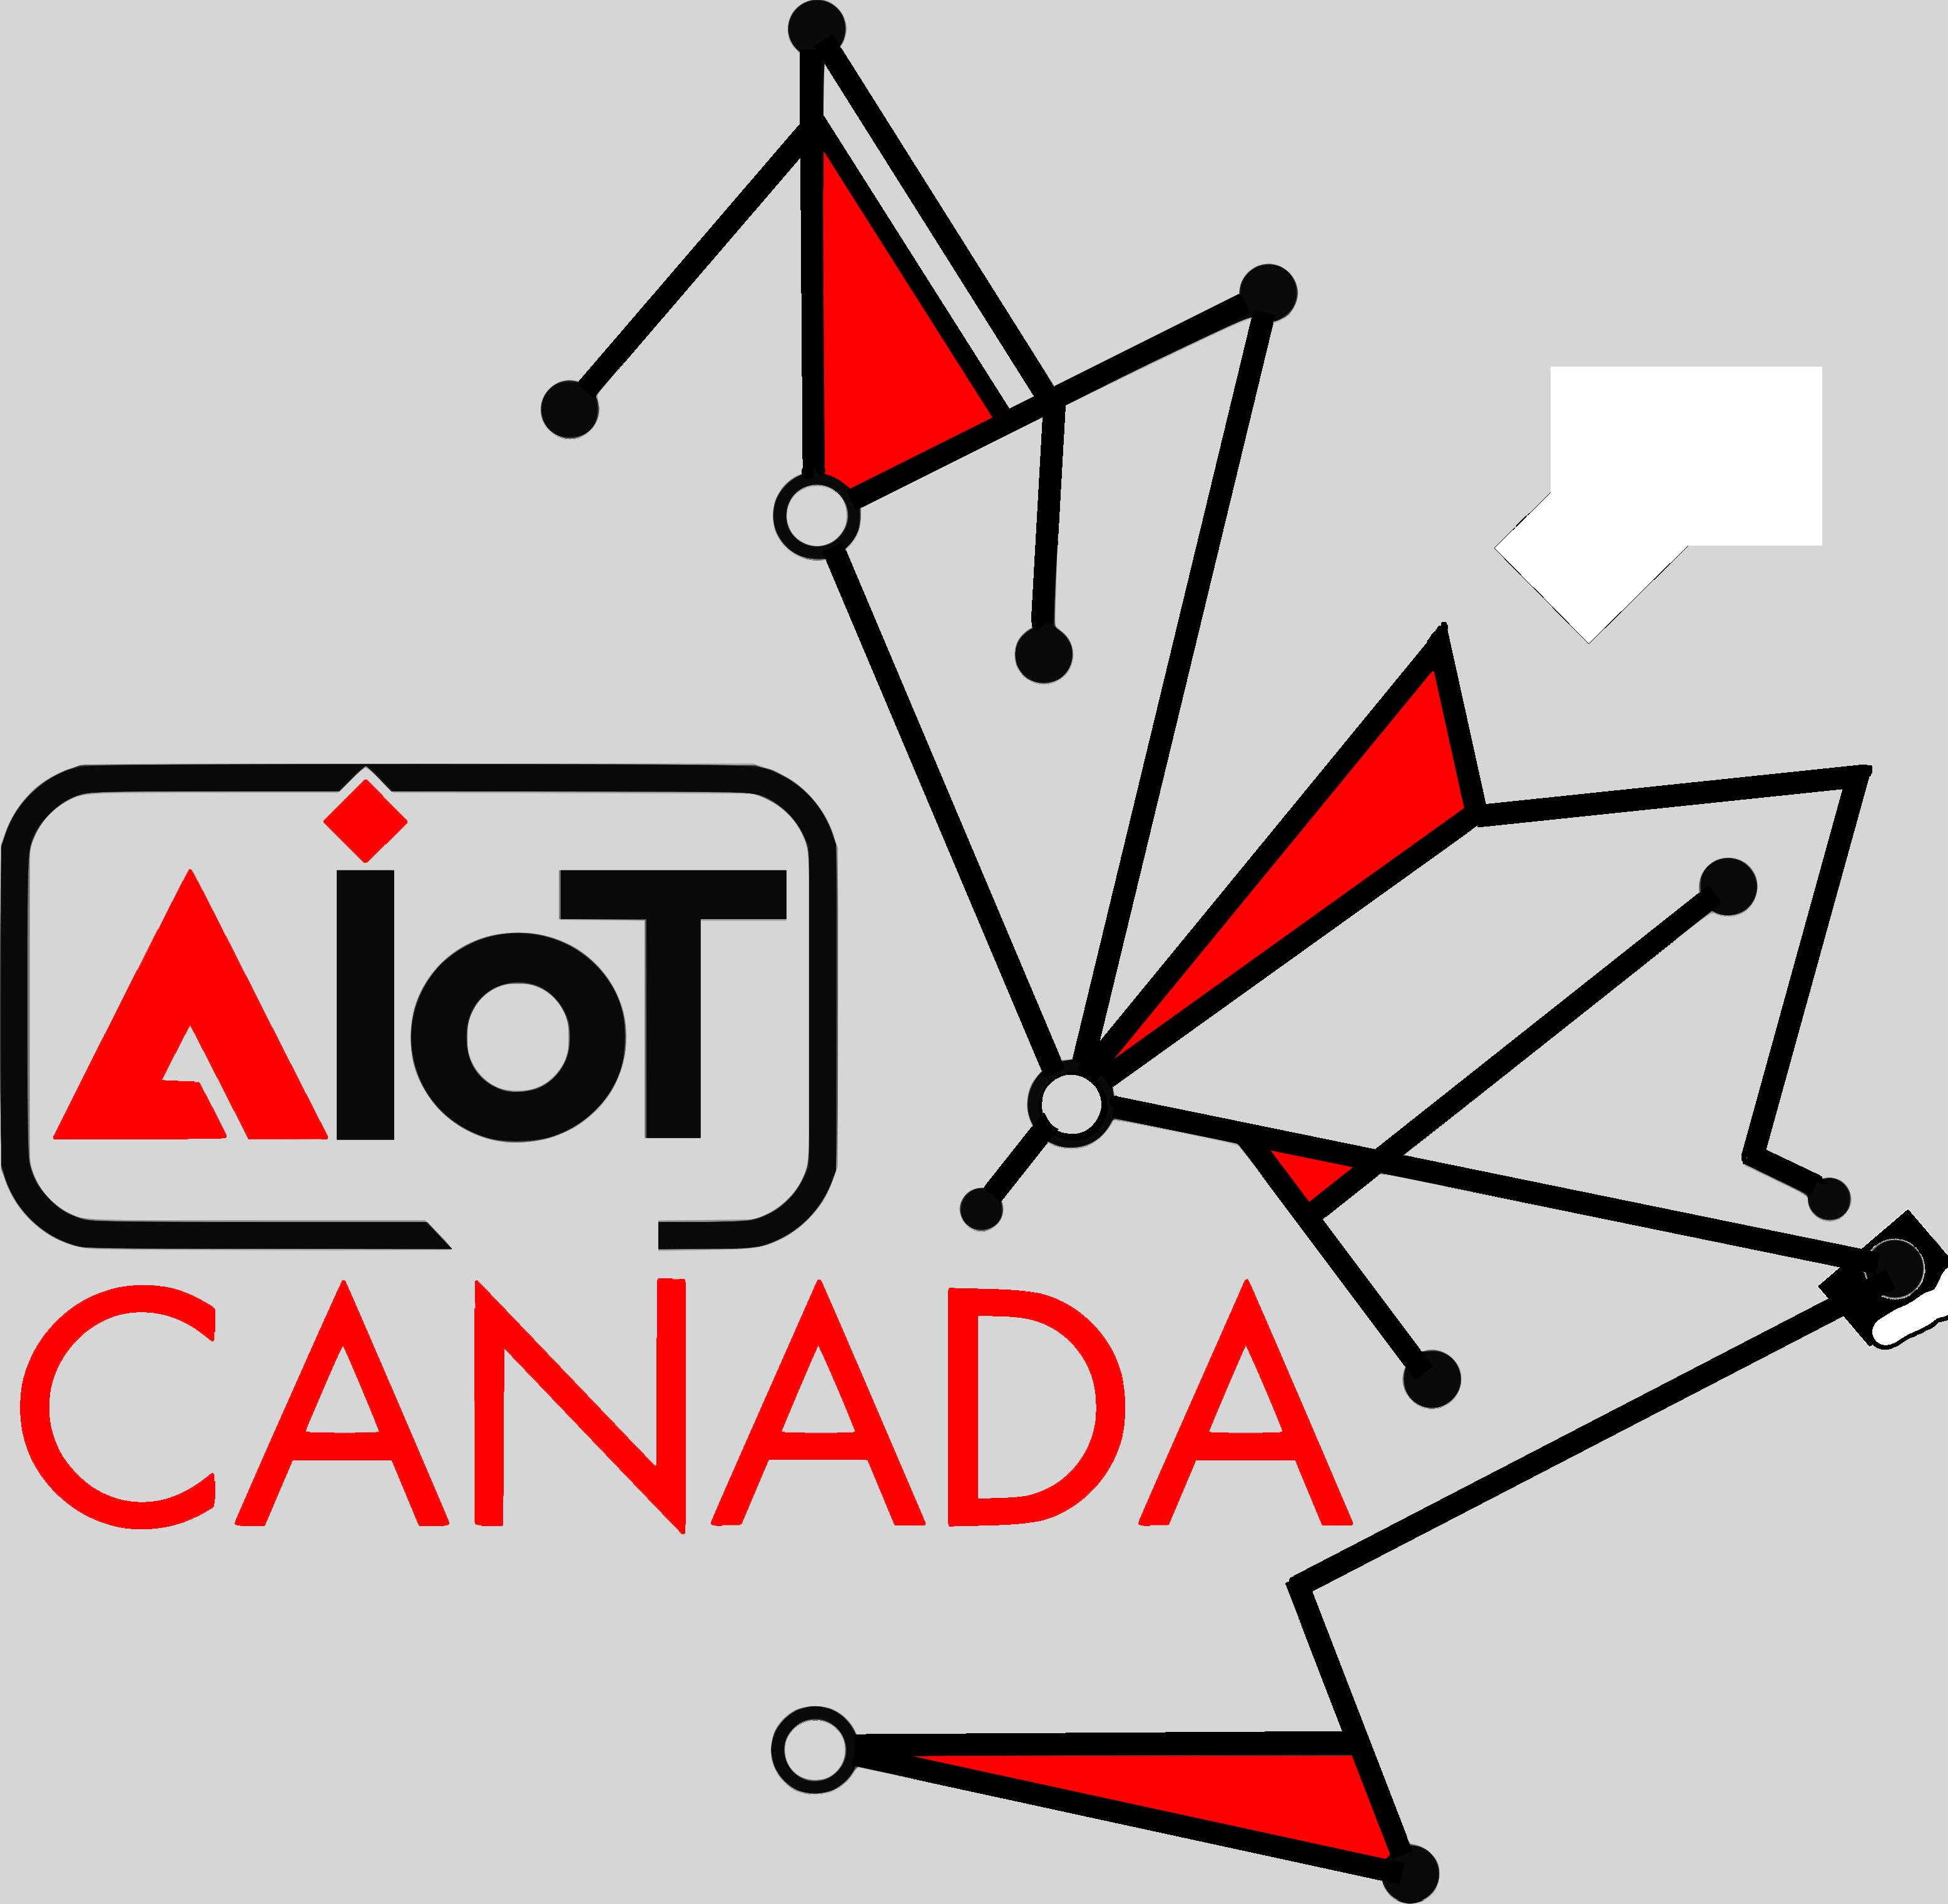 AIoT-Canada2